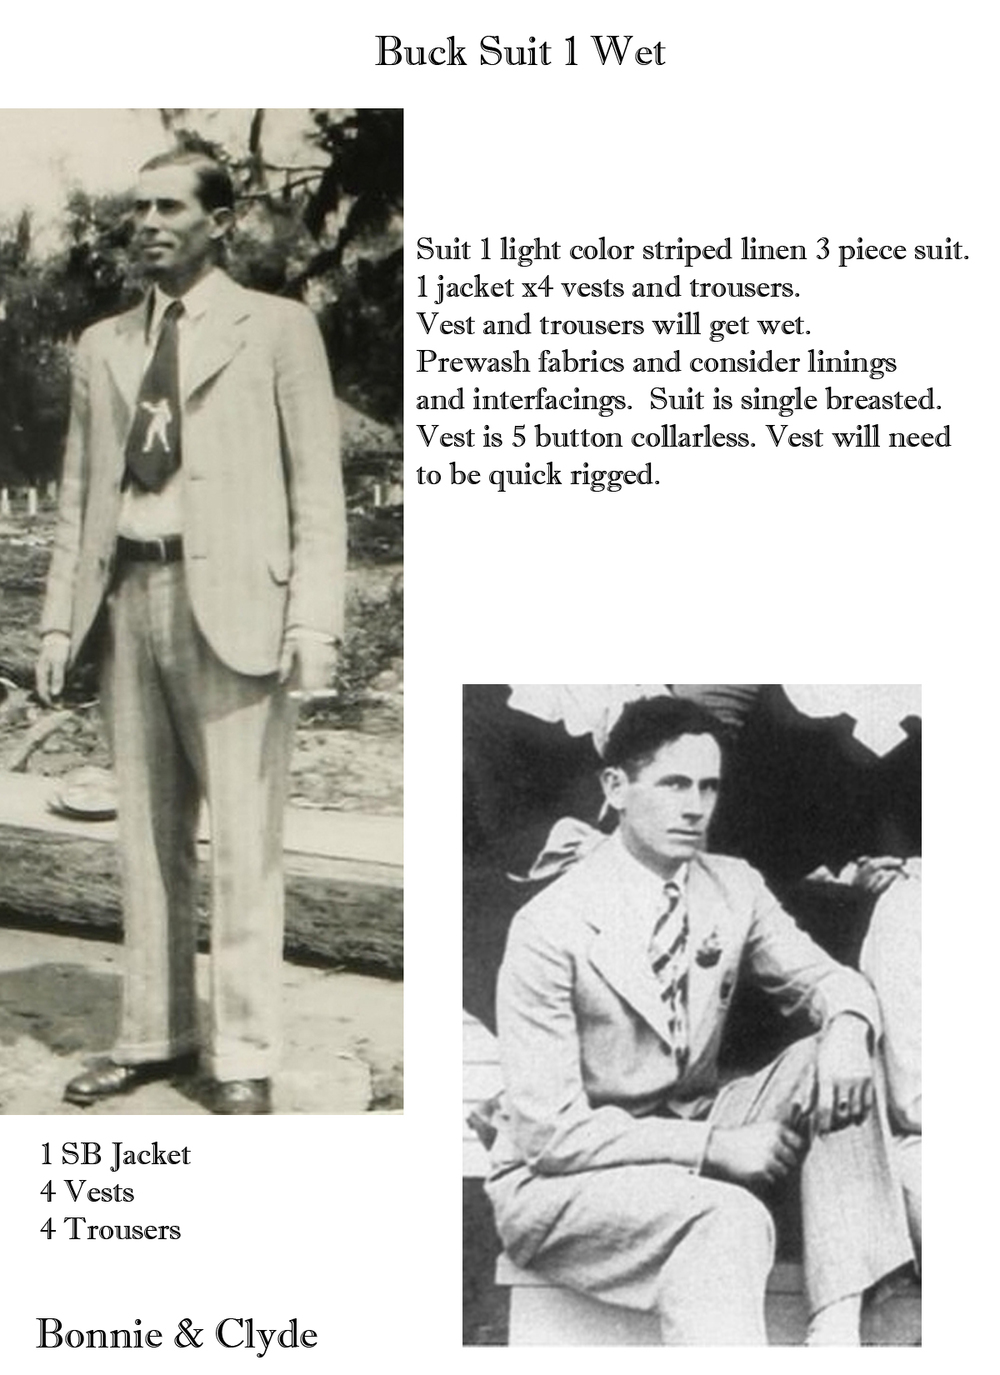 Buck Suit 1.jpg